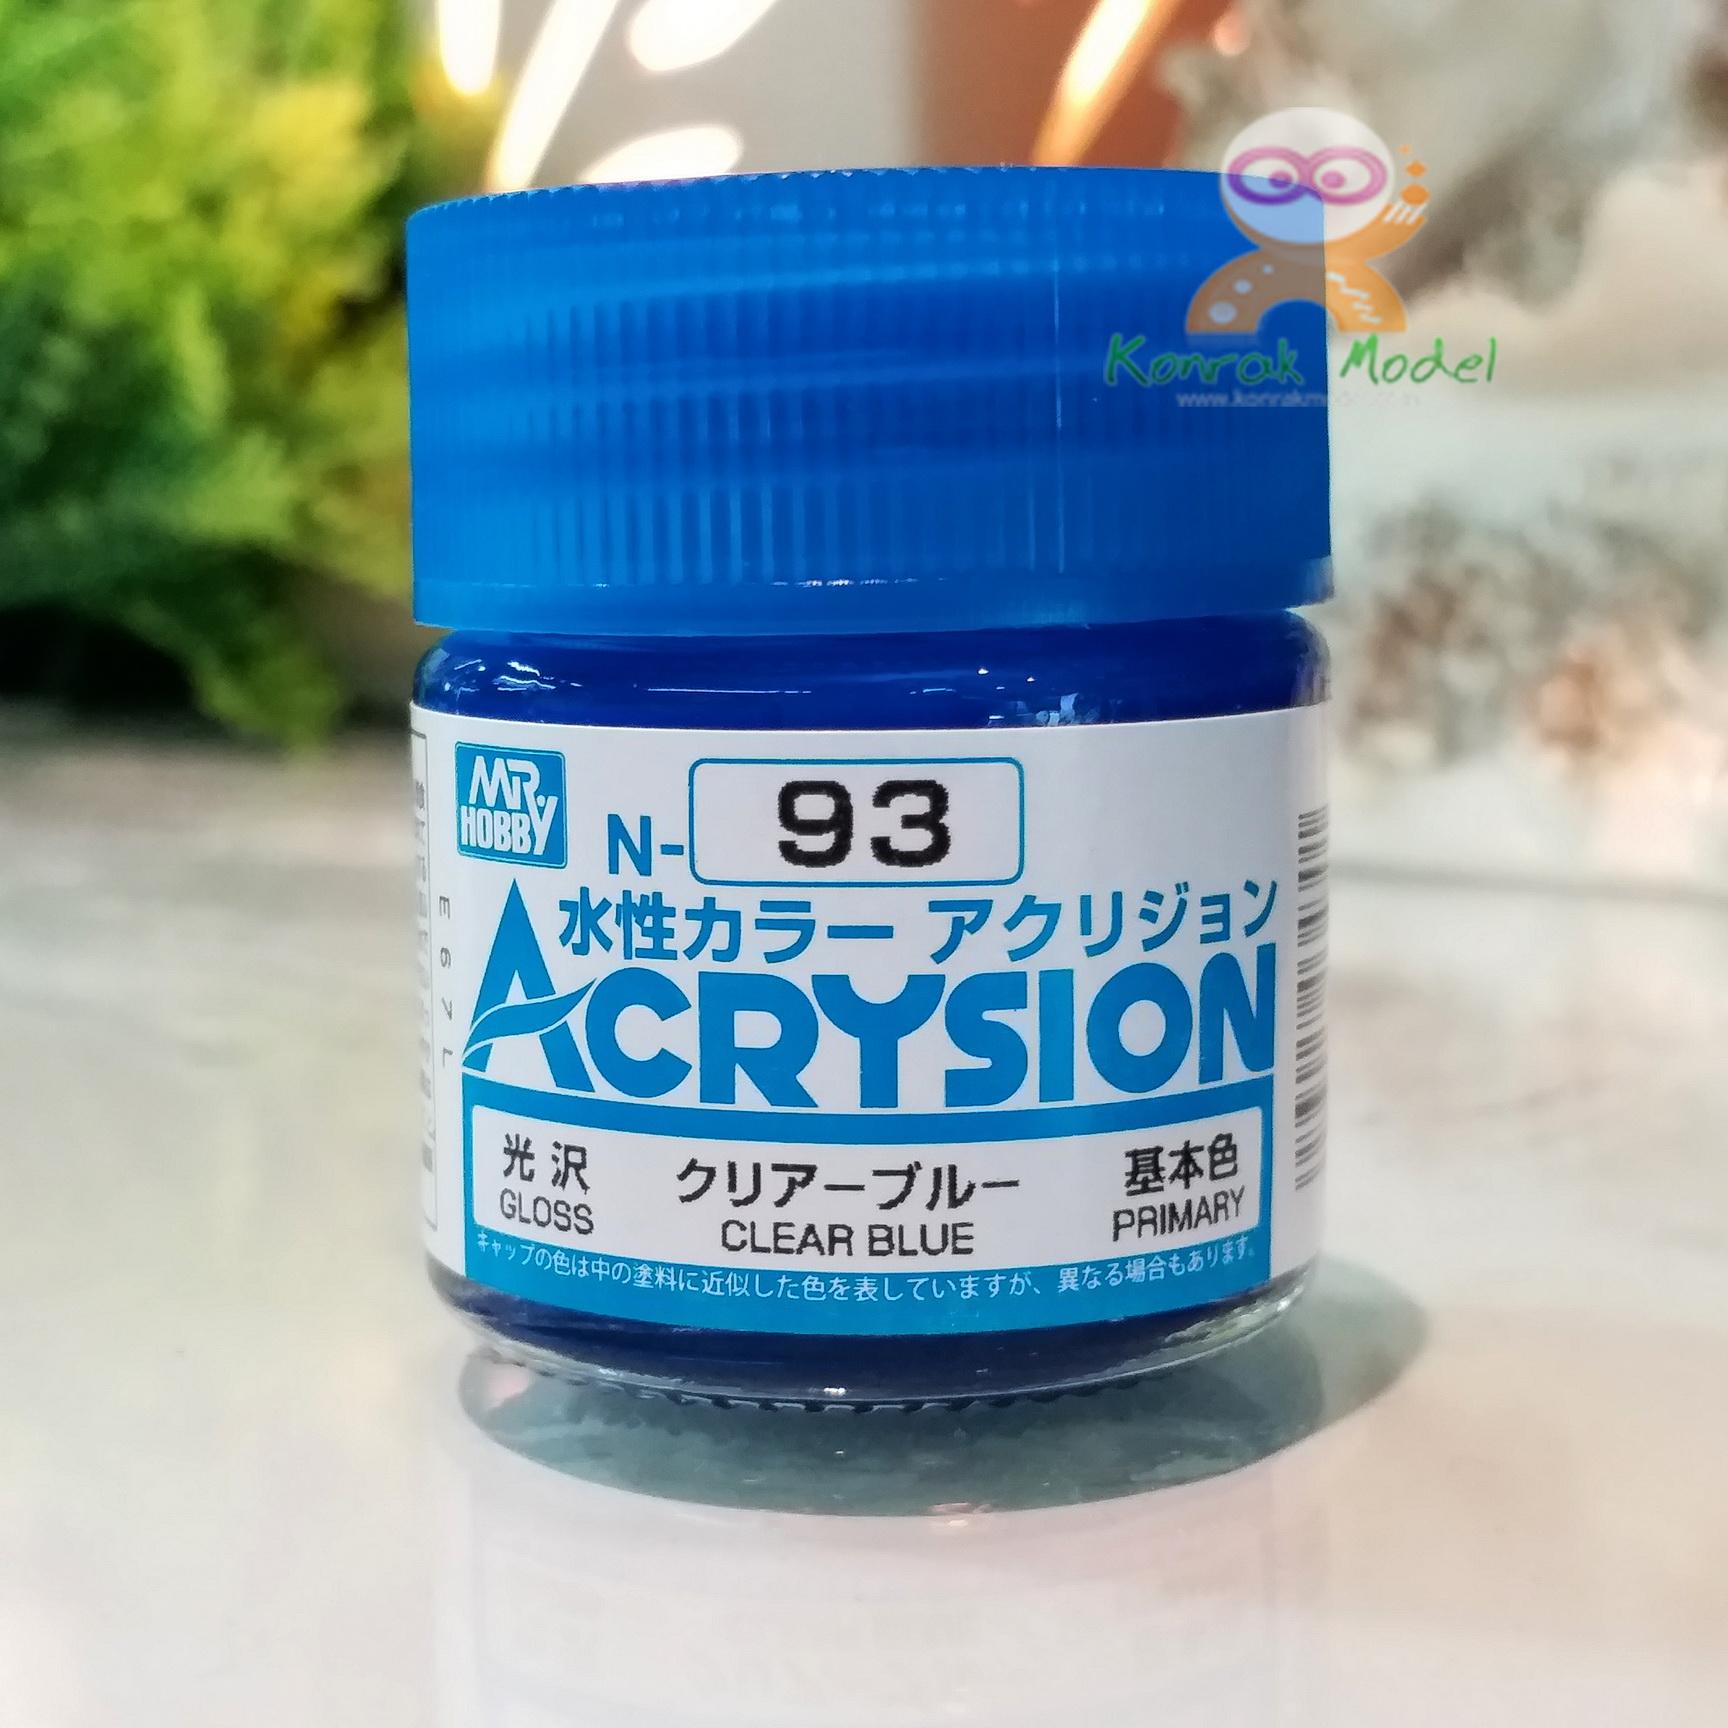 N93 CLEAR BLUE (Gloss) 10ml